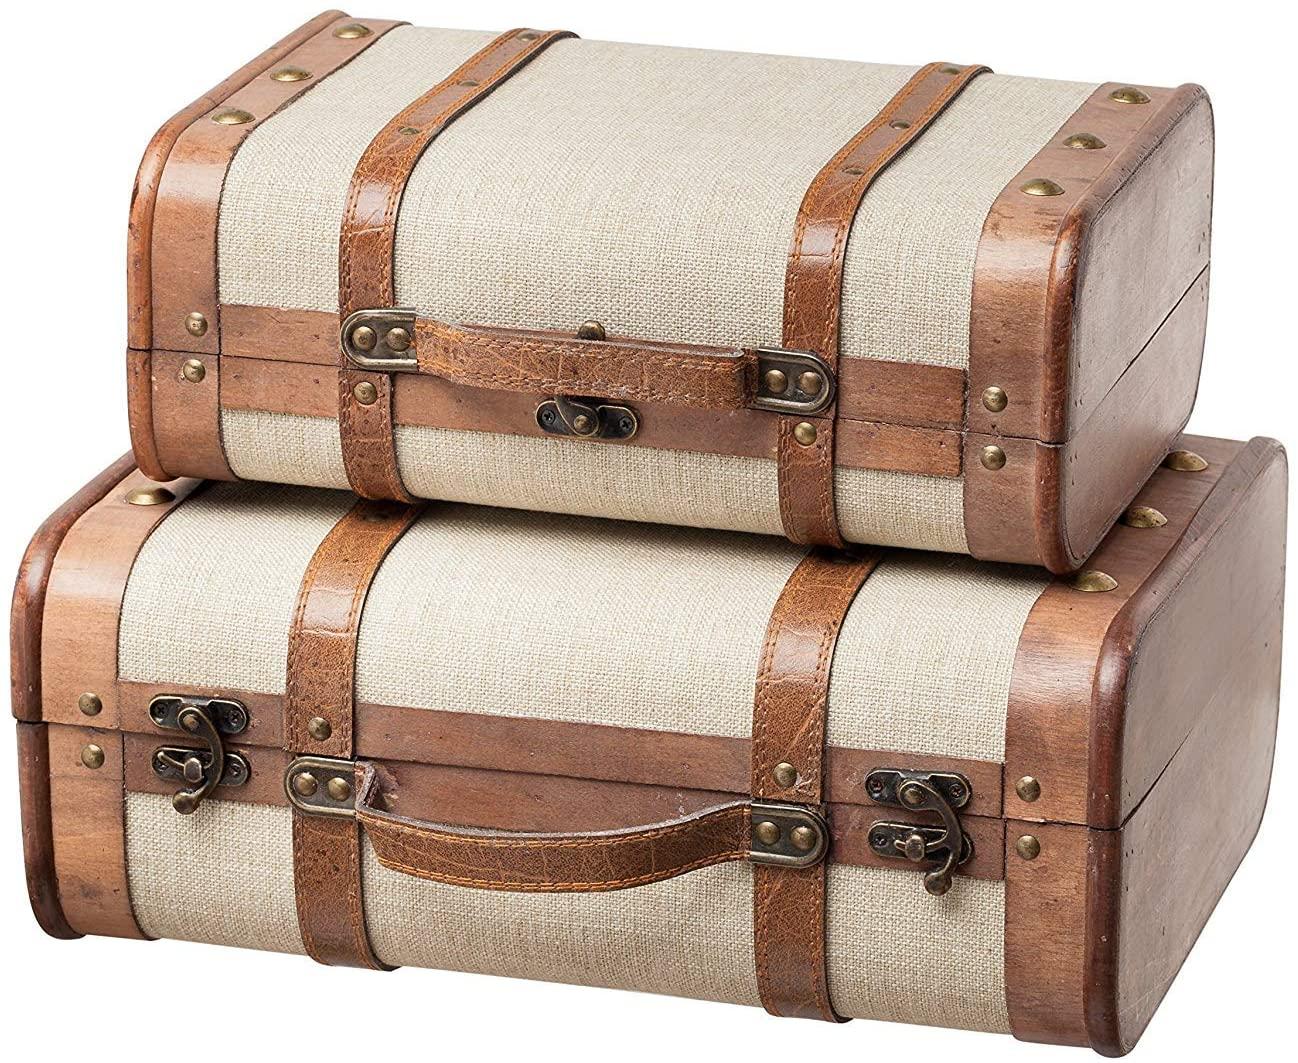 SLPR Decorative Wooden Storage Chest - Set of 2   Wood Trunk Suitcase with Straps (Beige)   Antique Nesting Trunks